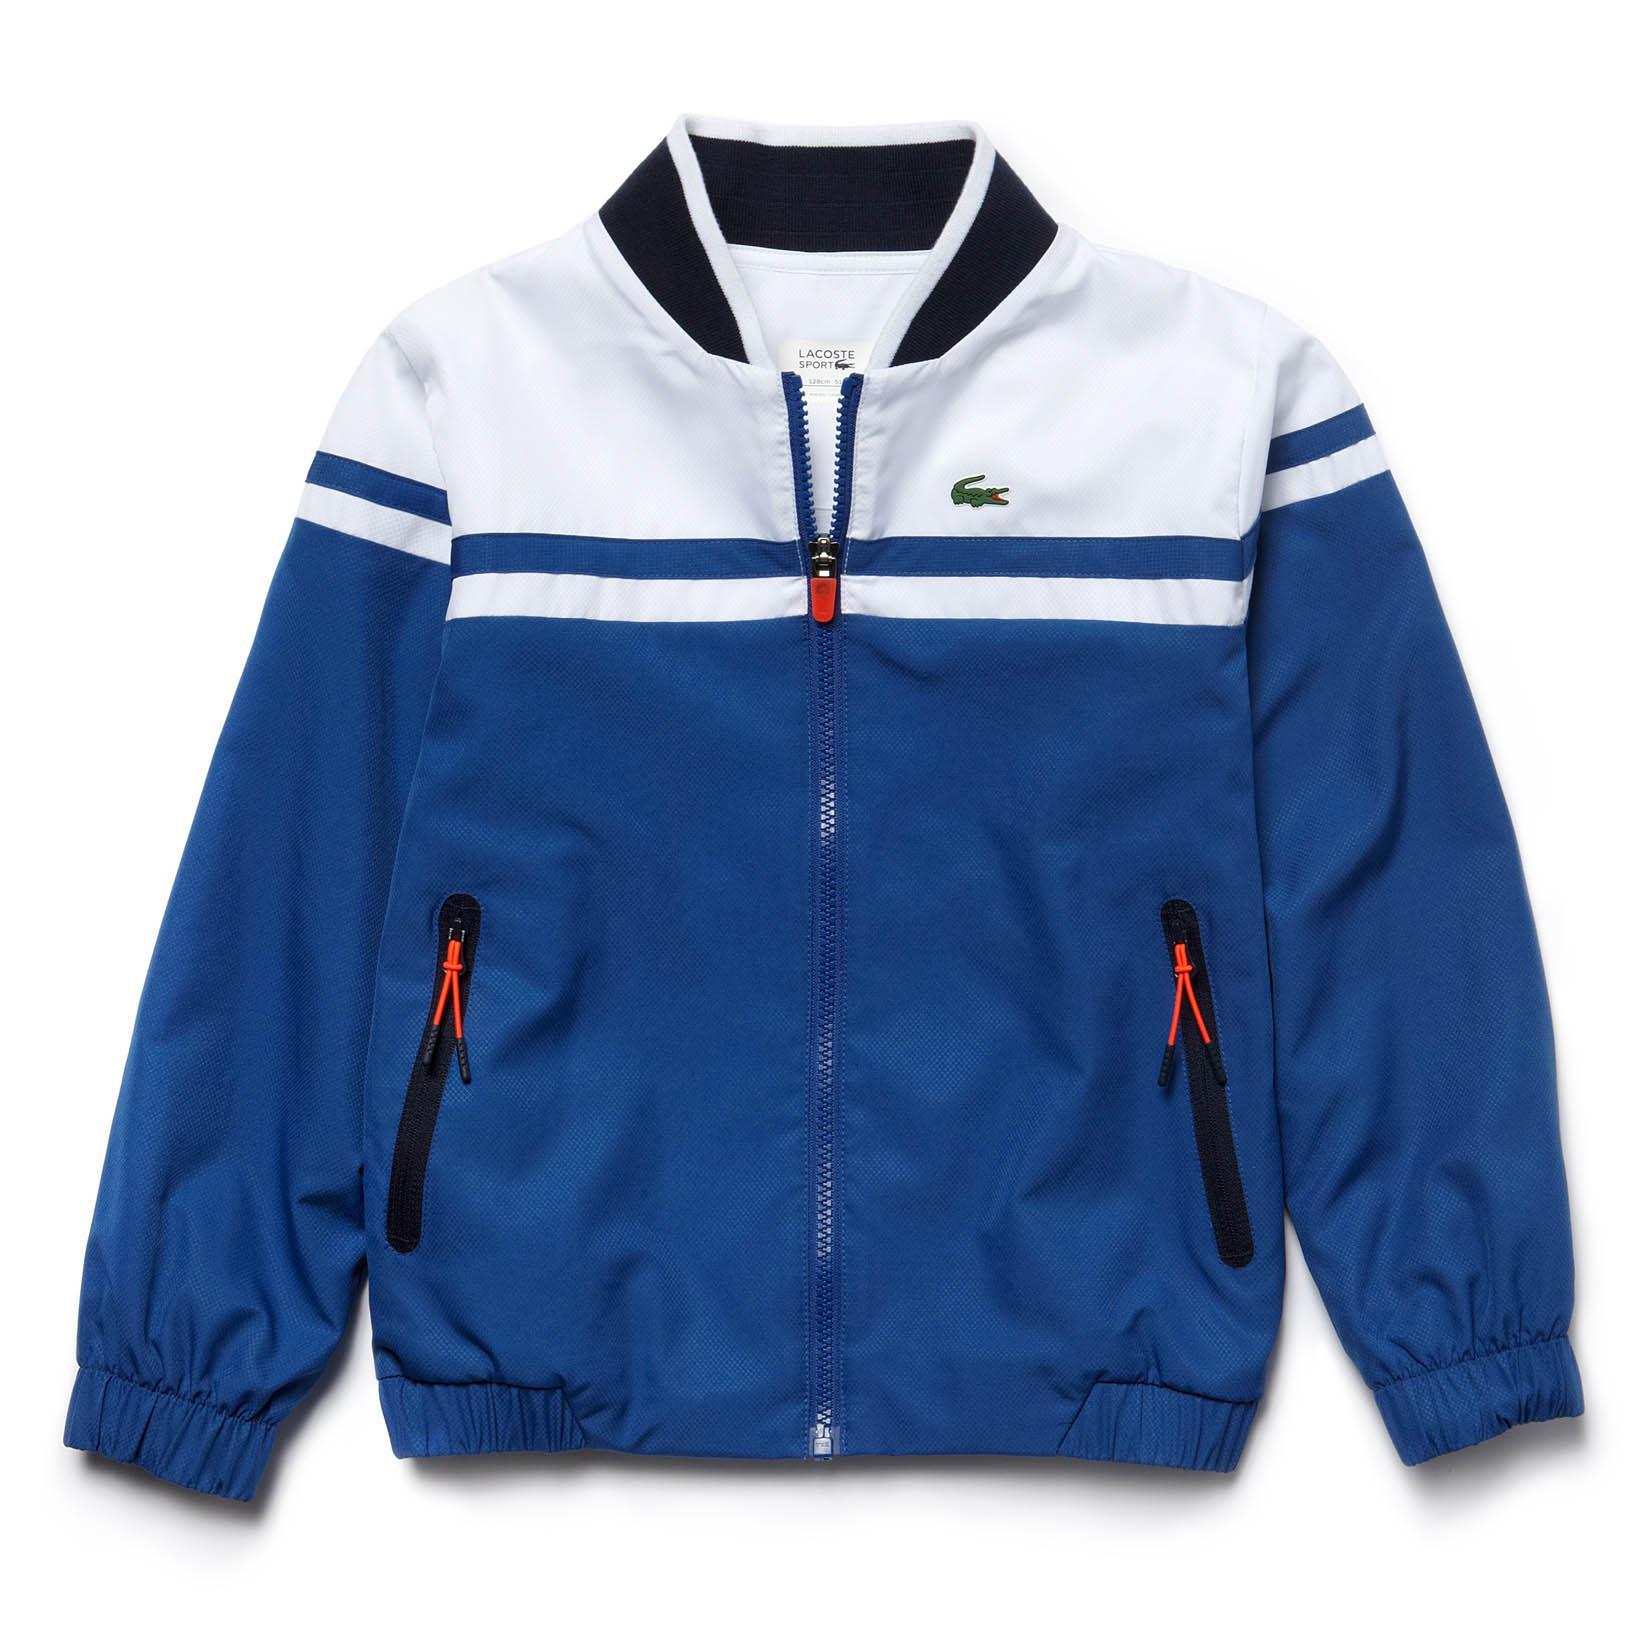 e605f61b2f0638 Lacoste Sport Boys Tracksuit - Blue White Navy - Tennisnuts.com